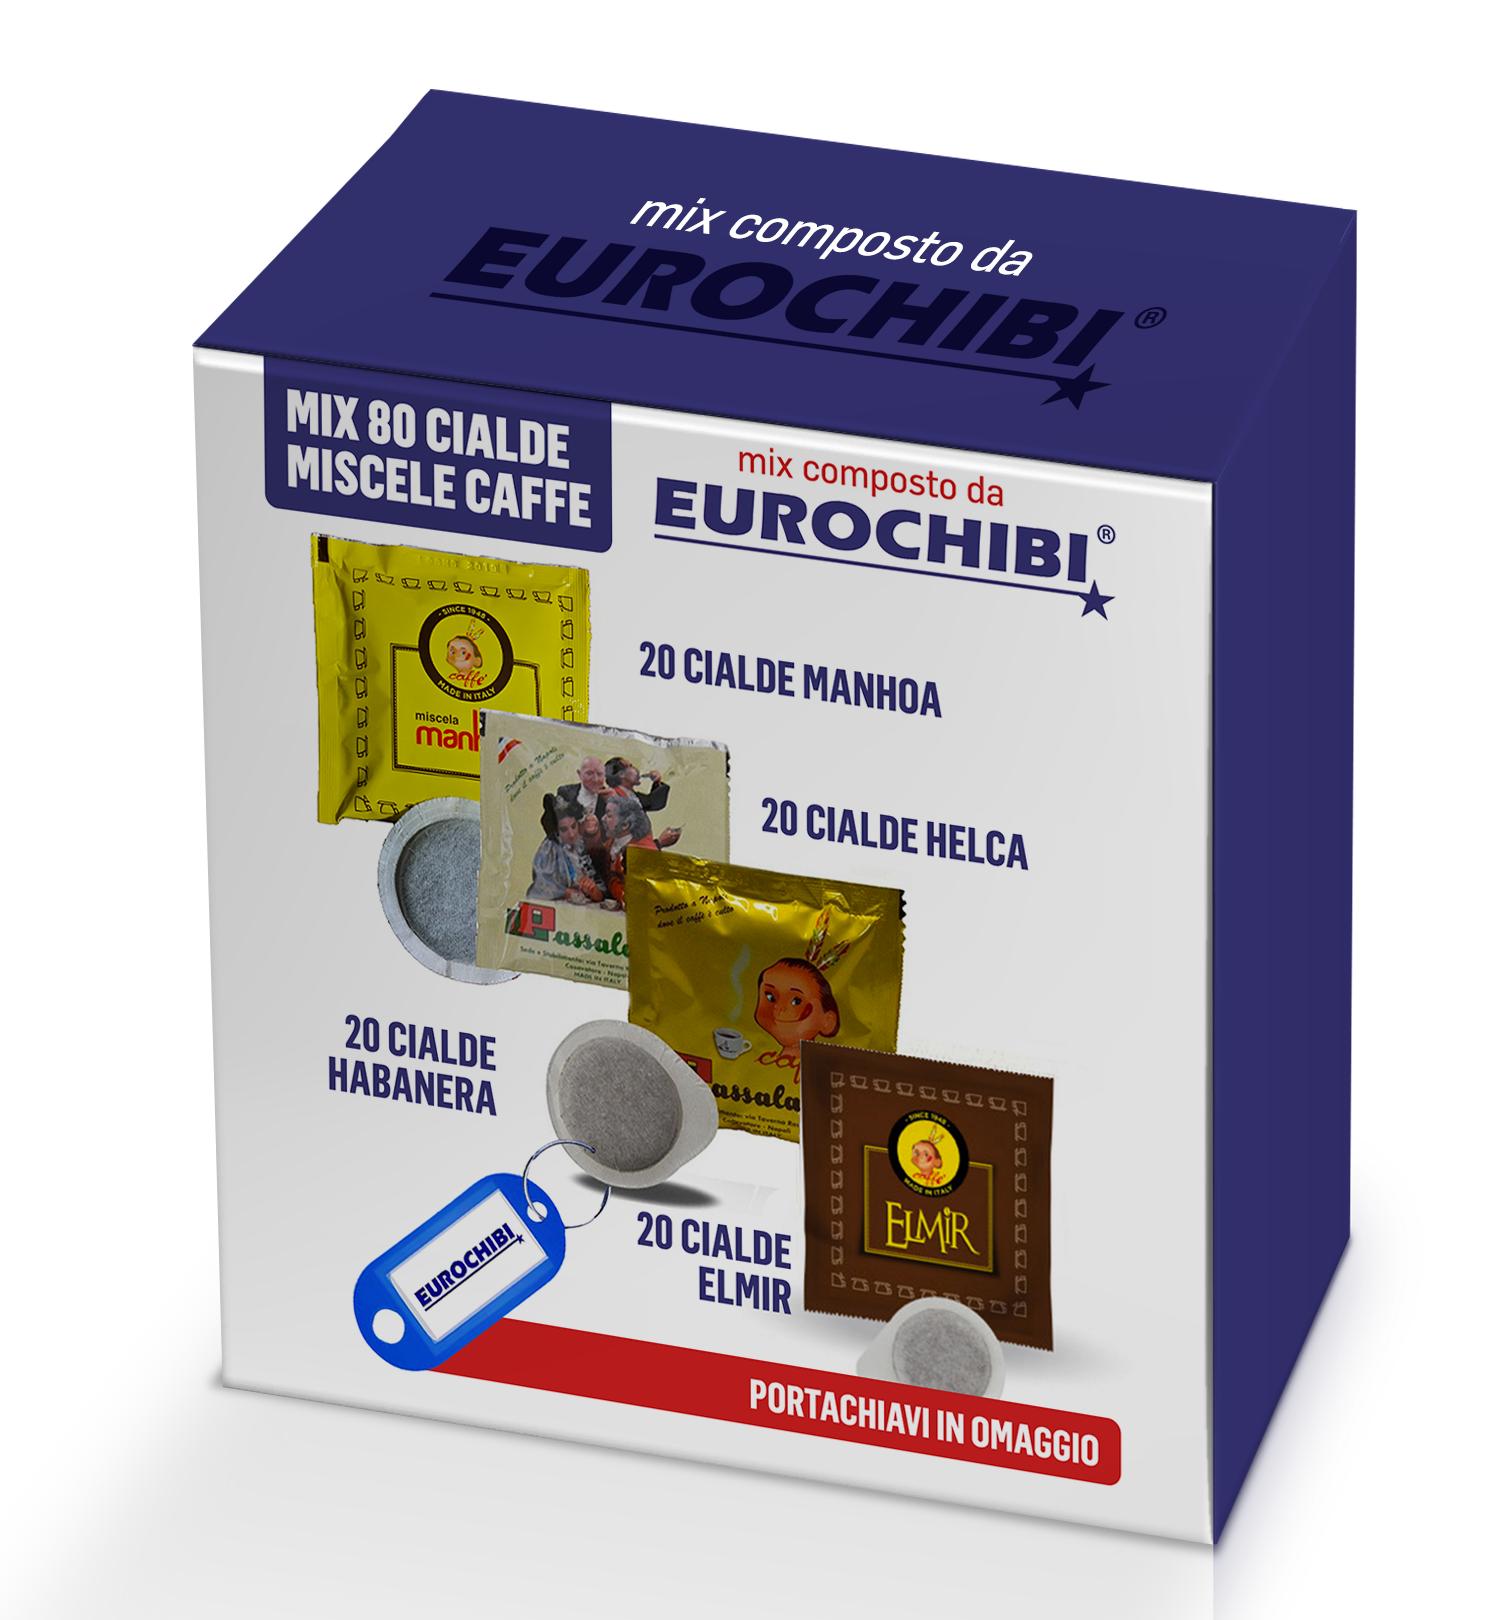 Eurochibi Mix 80 Cialde Caffè Passalacqua - 20 Manhoa - 20 Helca - 20 Habanera - 20 Elmir Con 1 Esclusivo Portachiavi ®